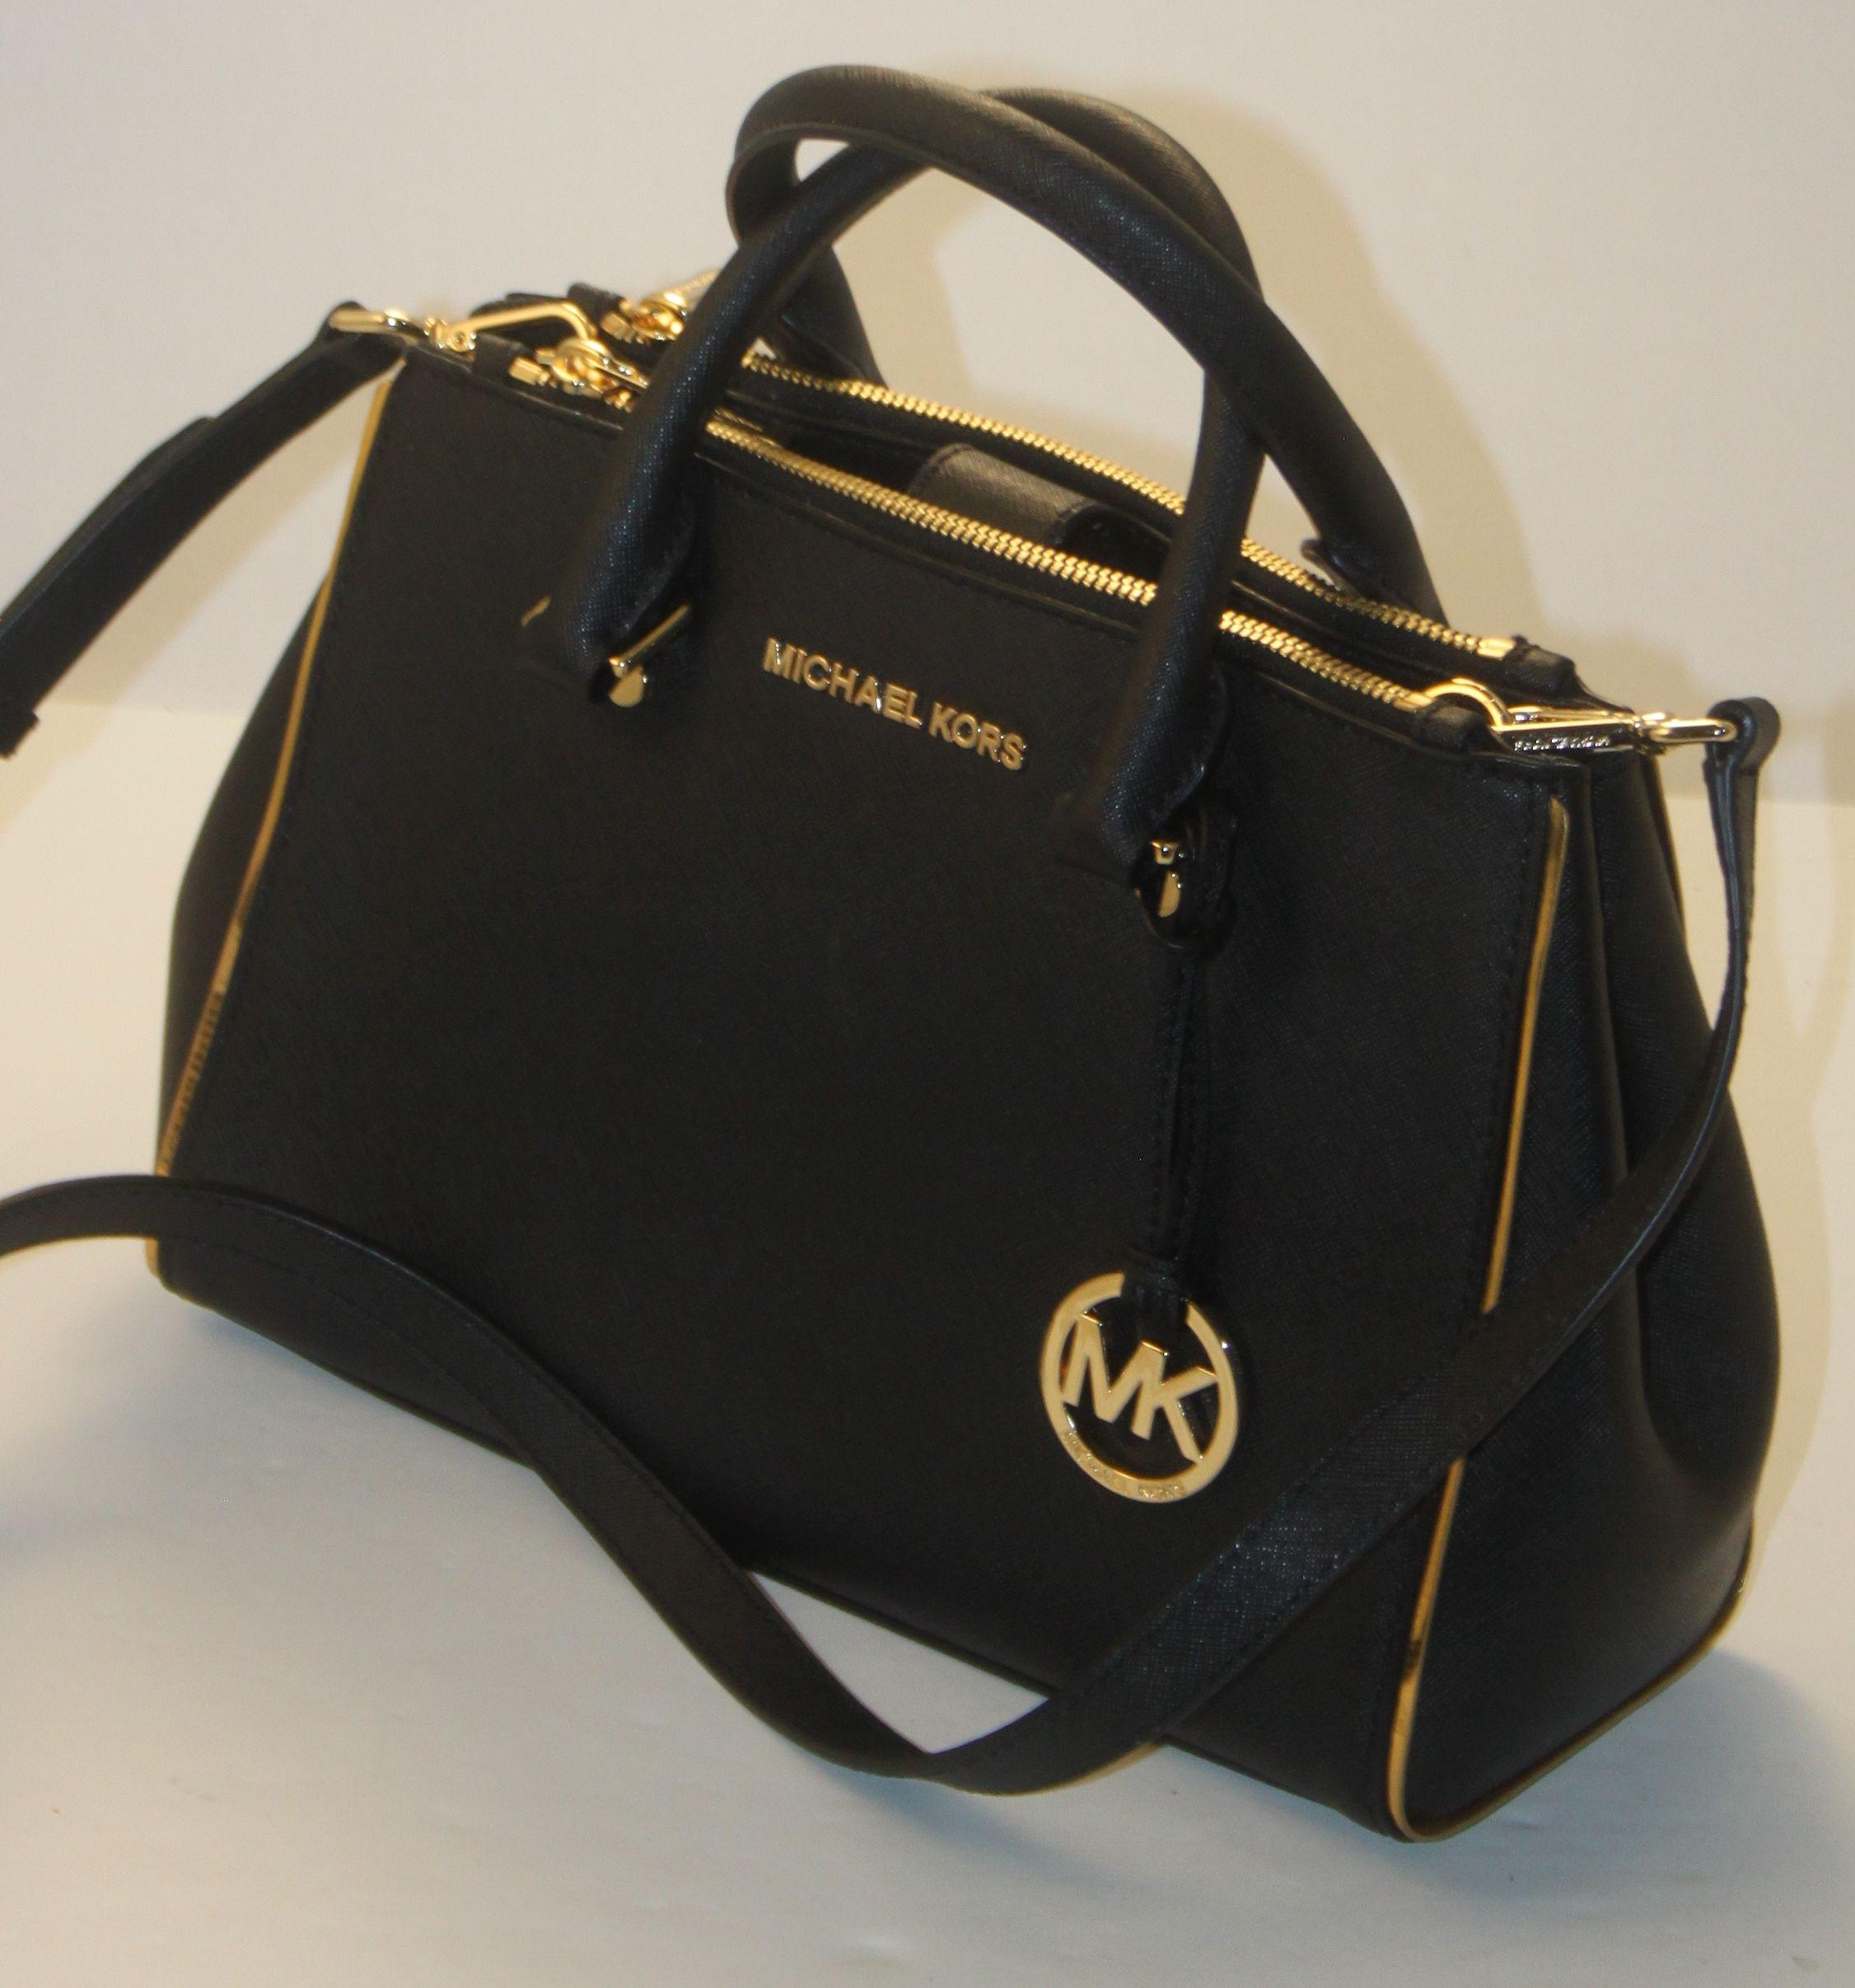 cheap michael kors handbags on sale 80% off clearance michael kors handbags outlet amazon